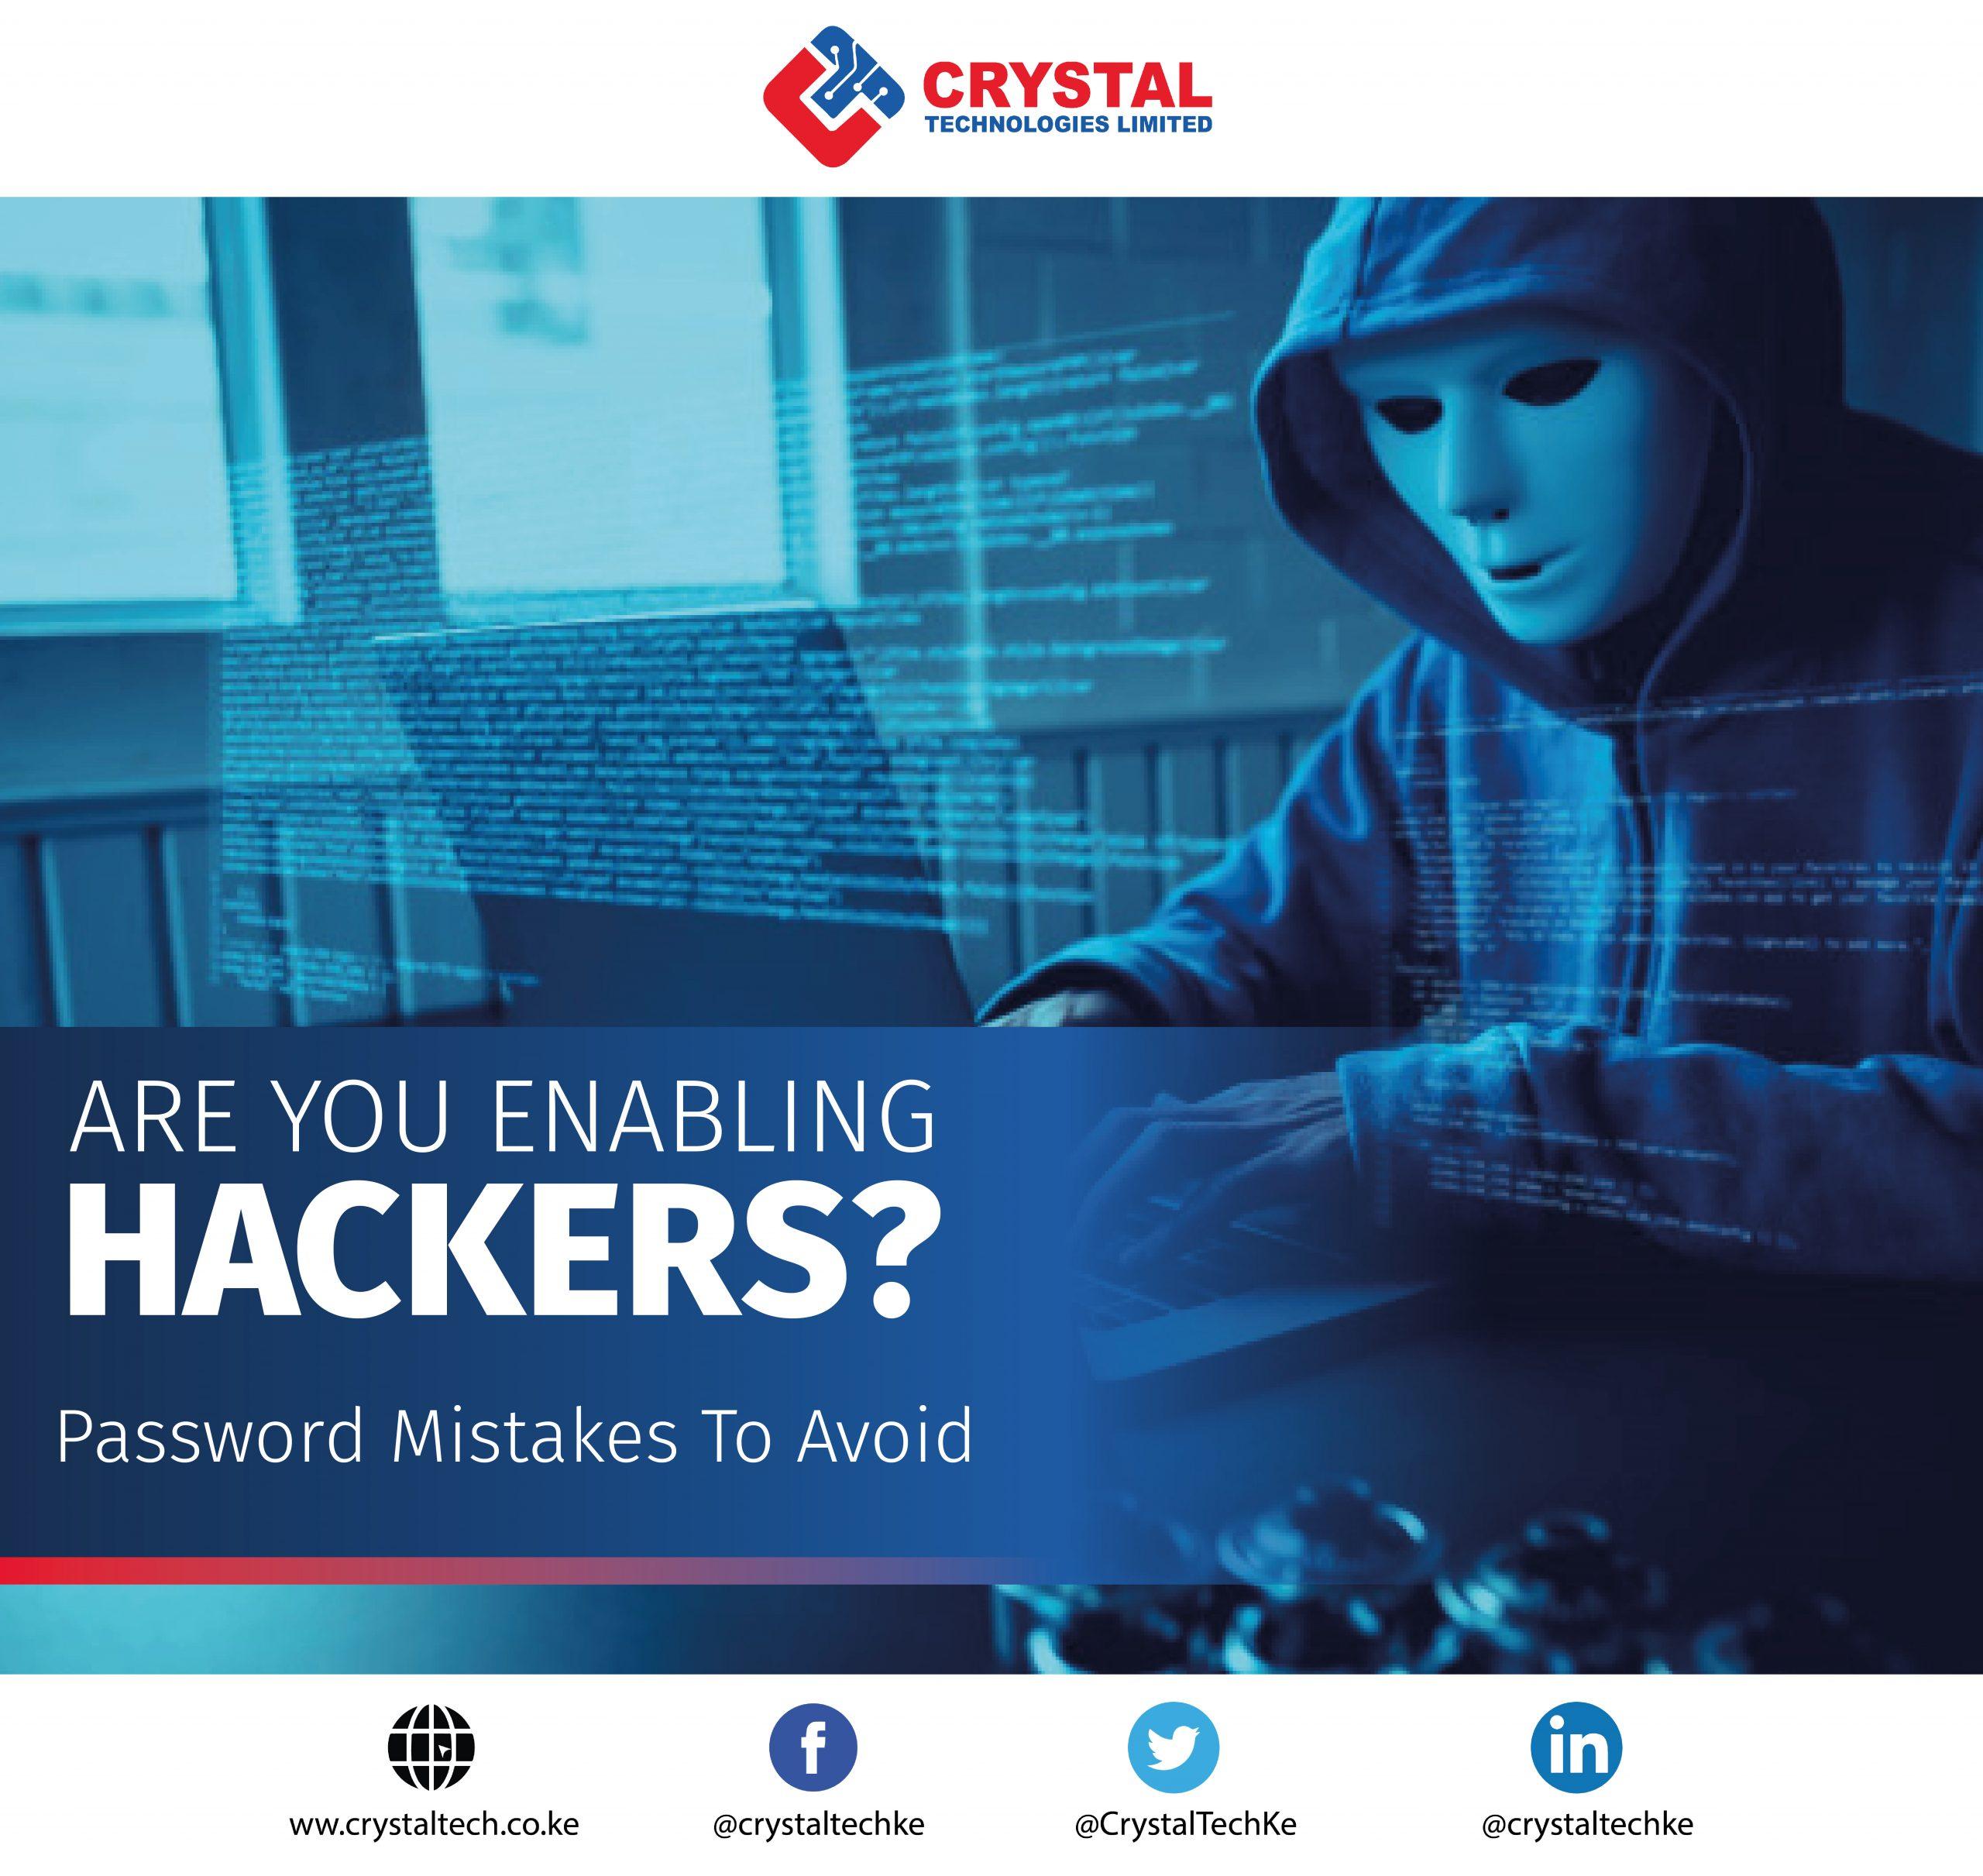 Password Mistakes To Avoid